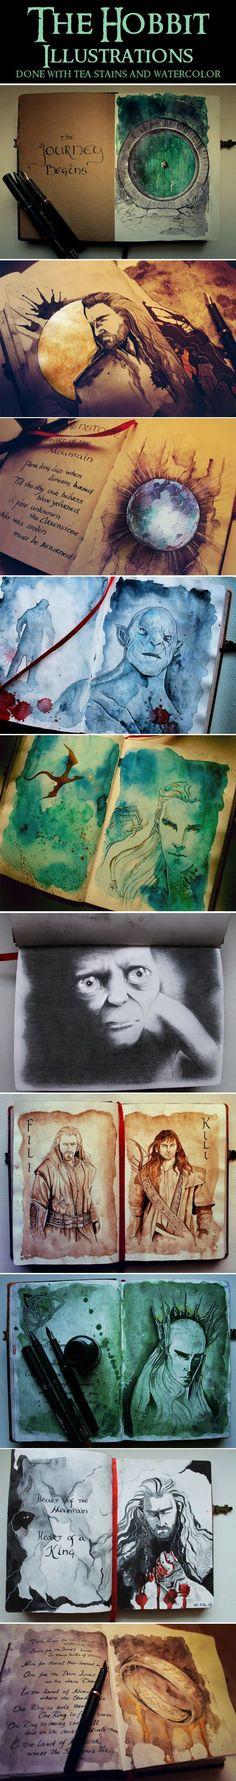 The Hobbit Illustrations… Oh my god.